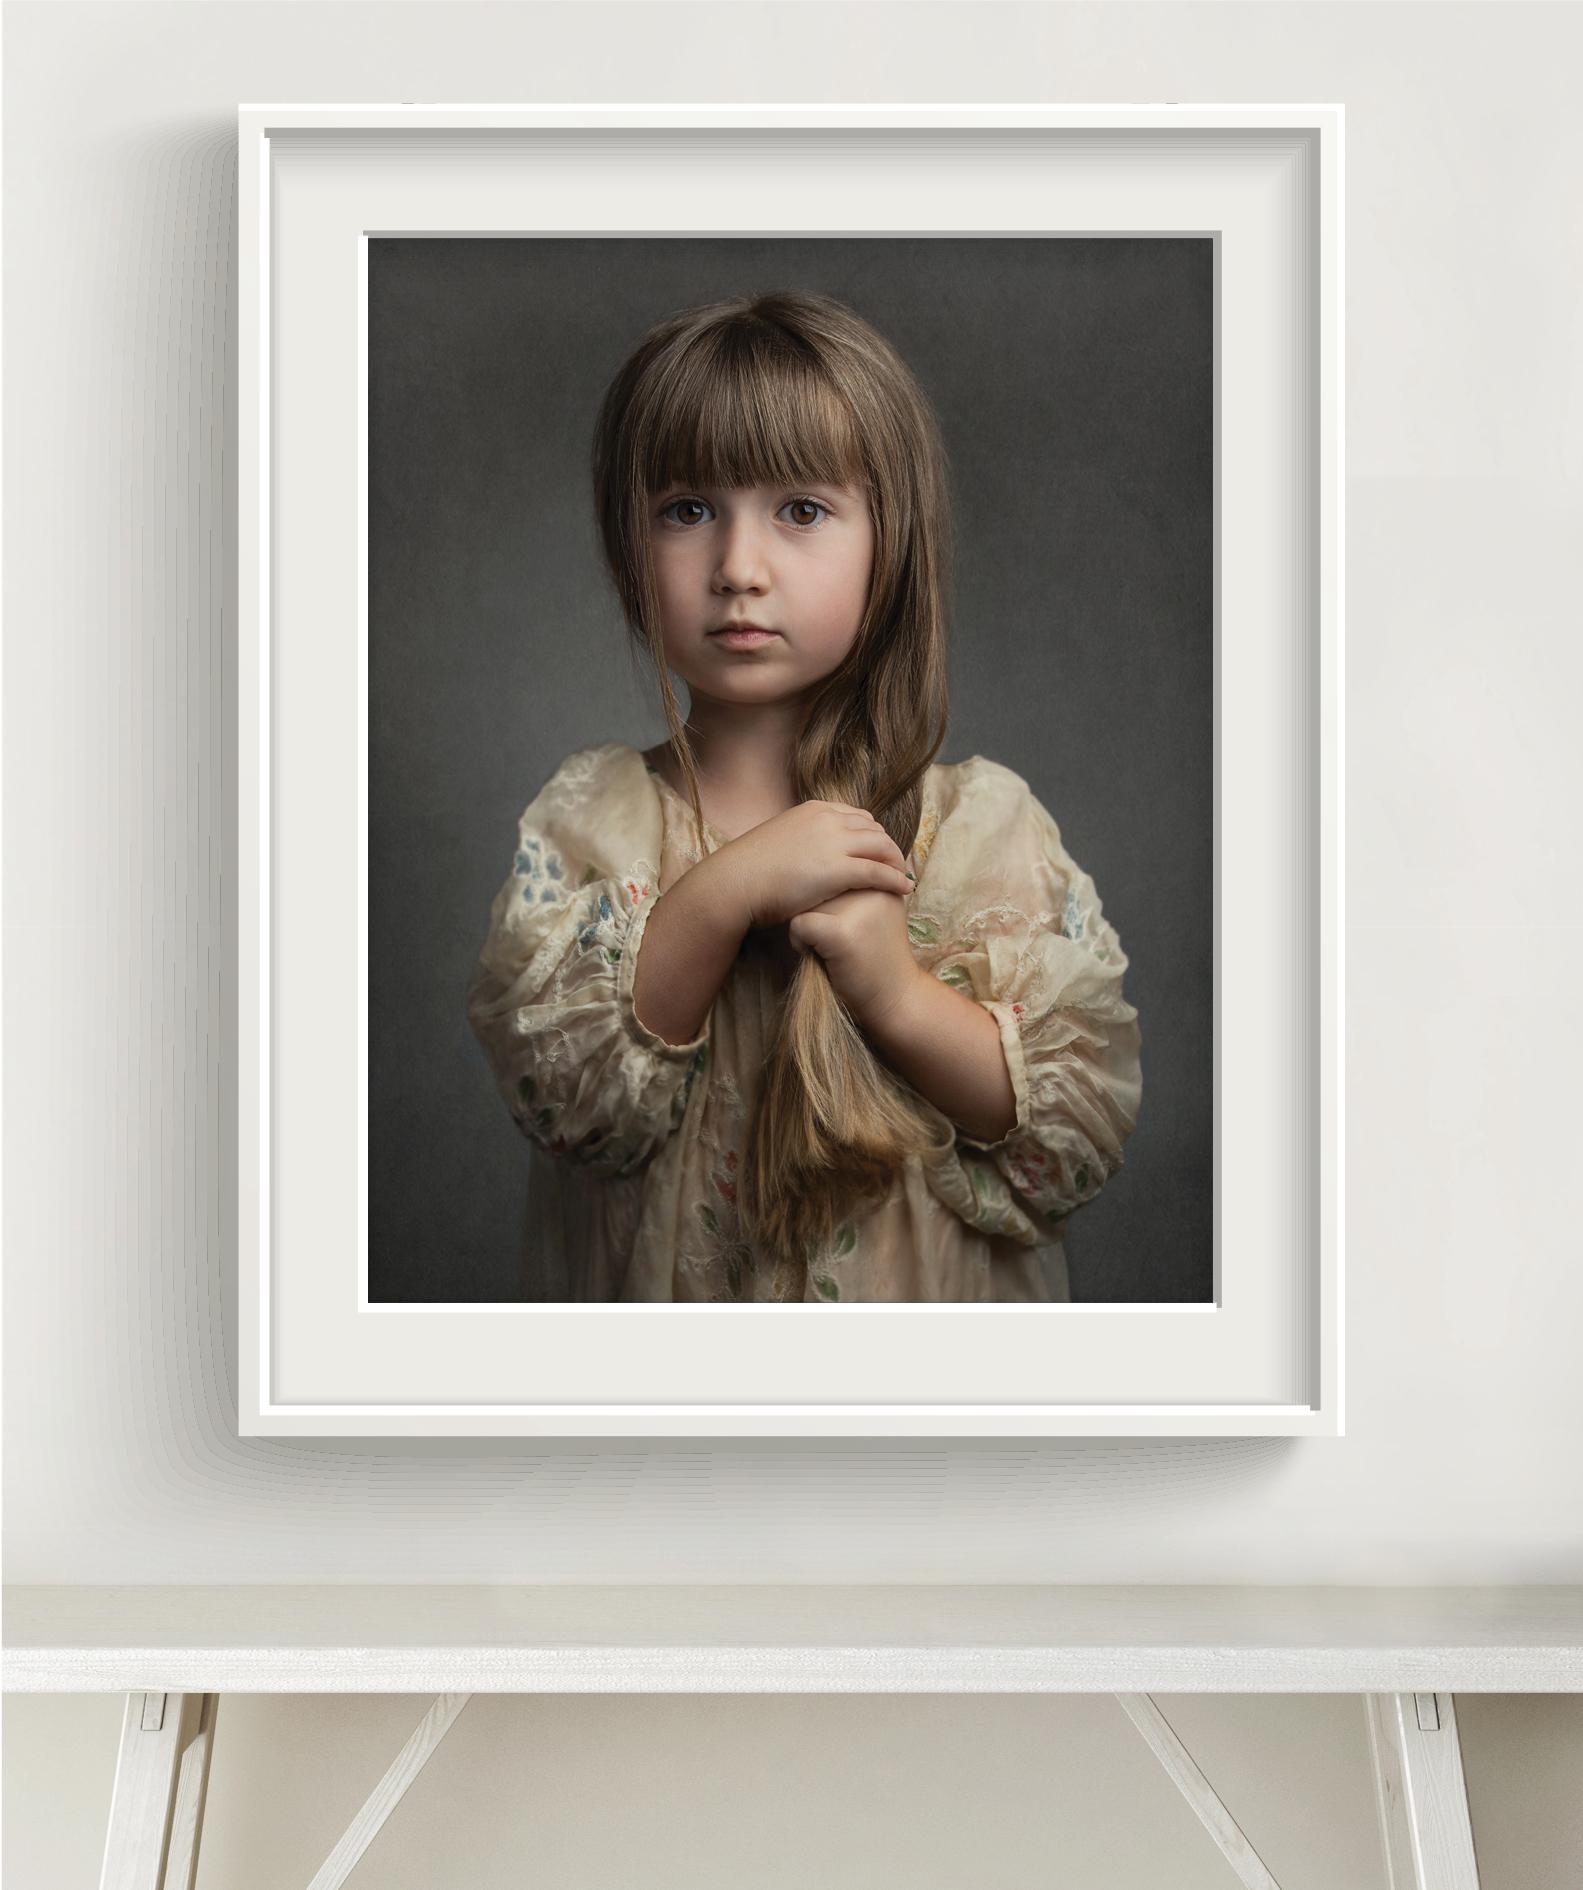 Large print 406 x 486mm